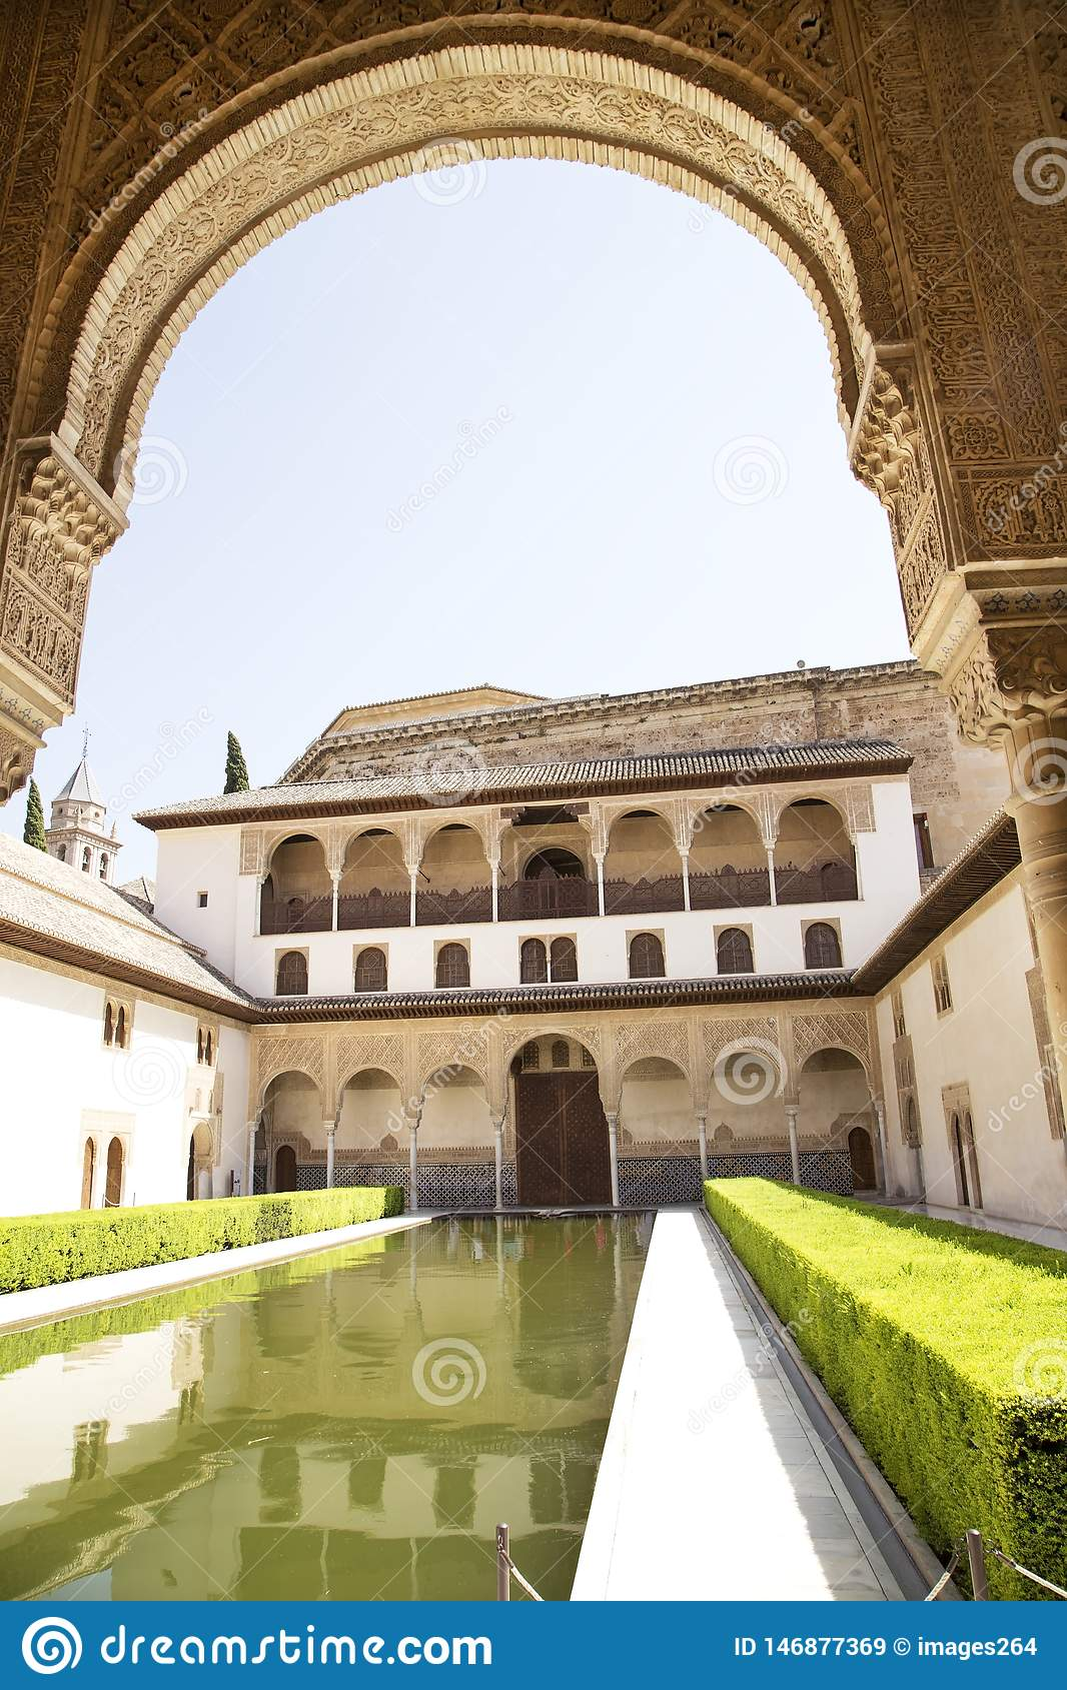 Palacio Nazaries - Alhambra